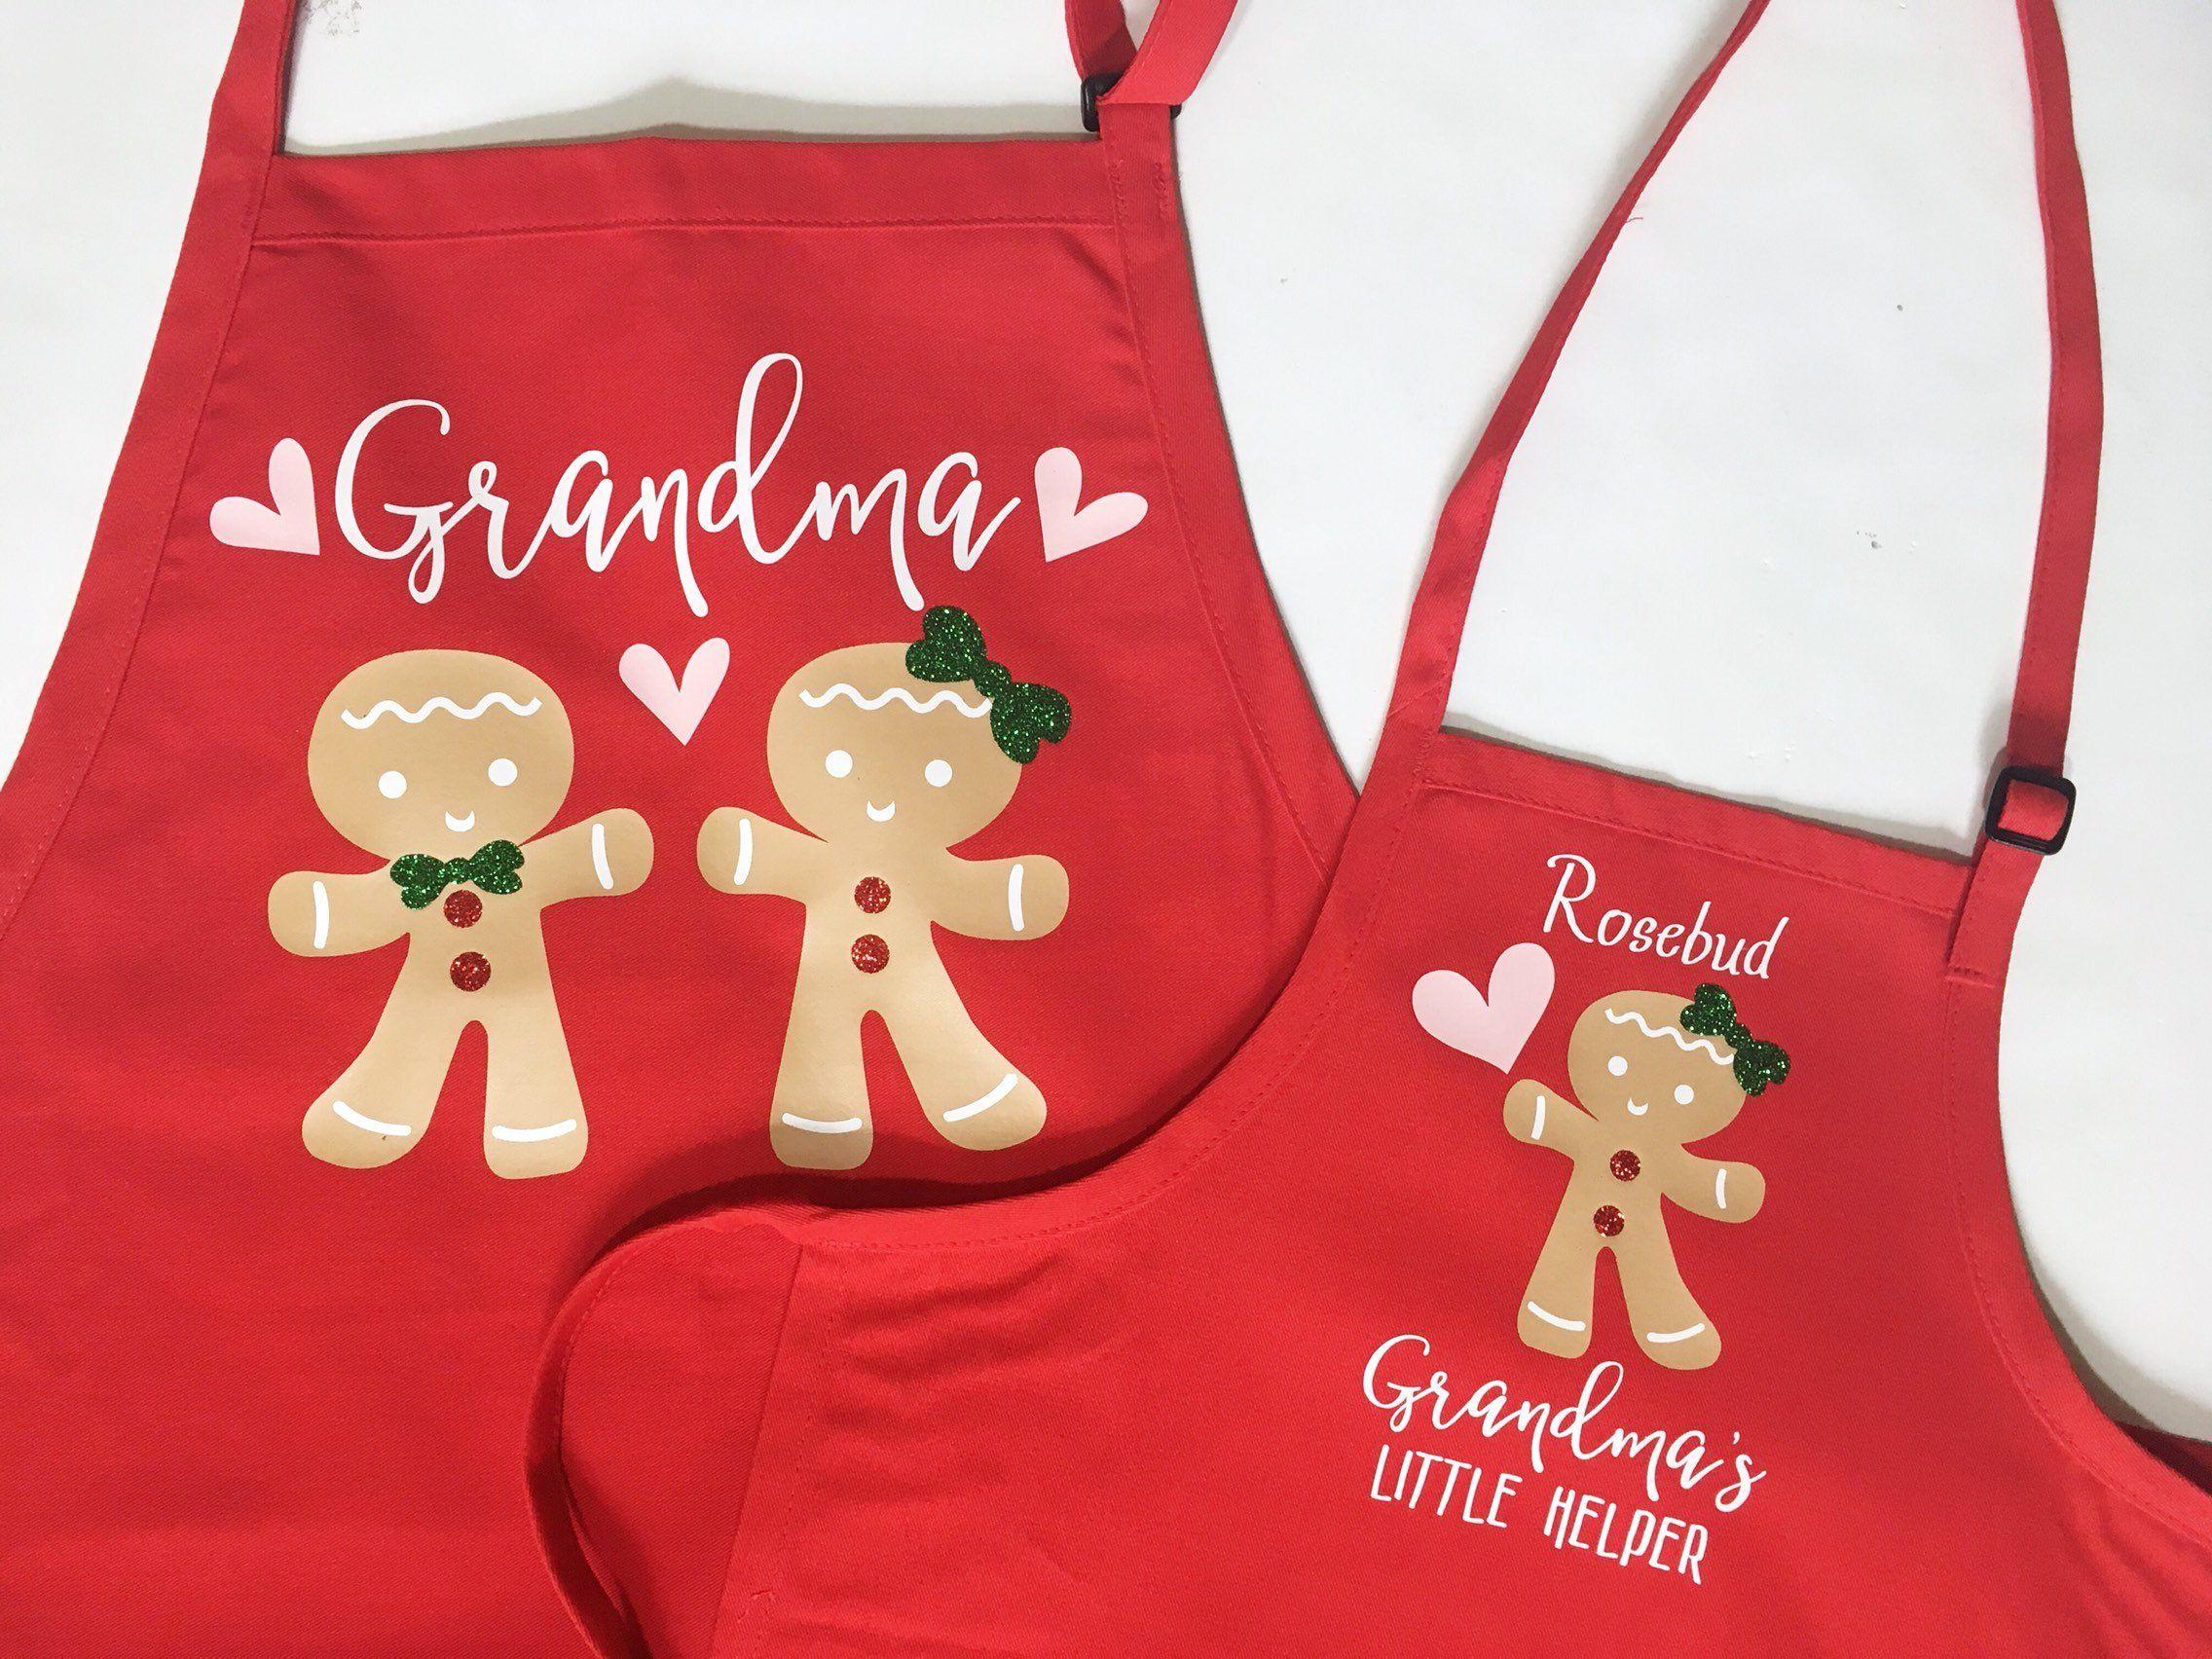 a0fe227b3862 Grandma Christmas apron, Child matching apron, cooking apron set, baking  apron, grandchild